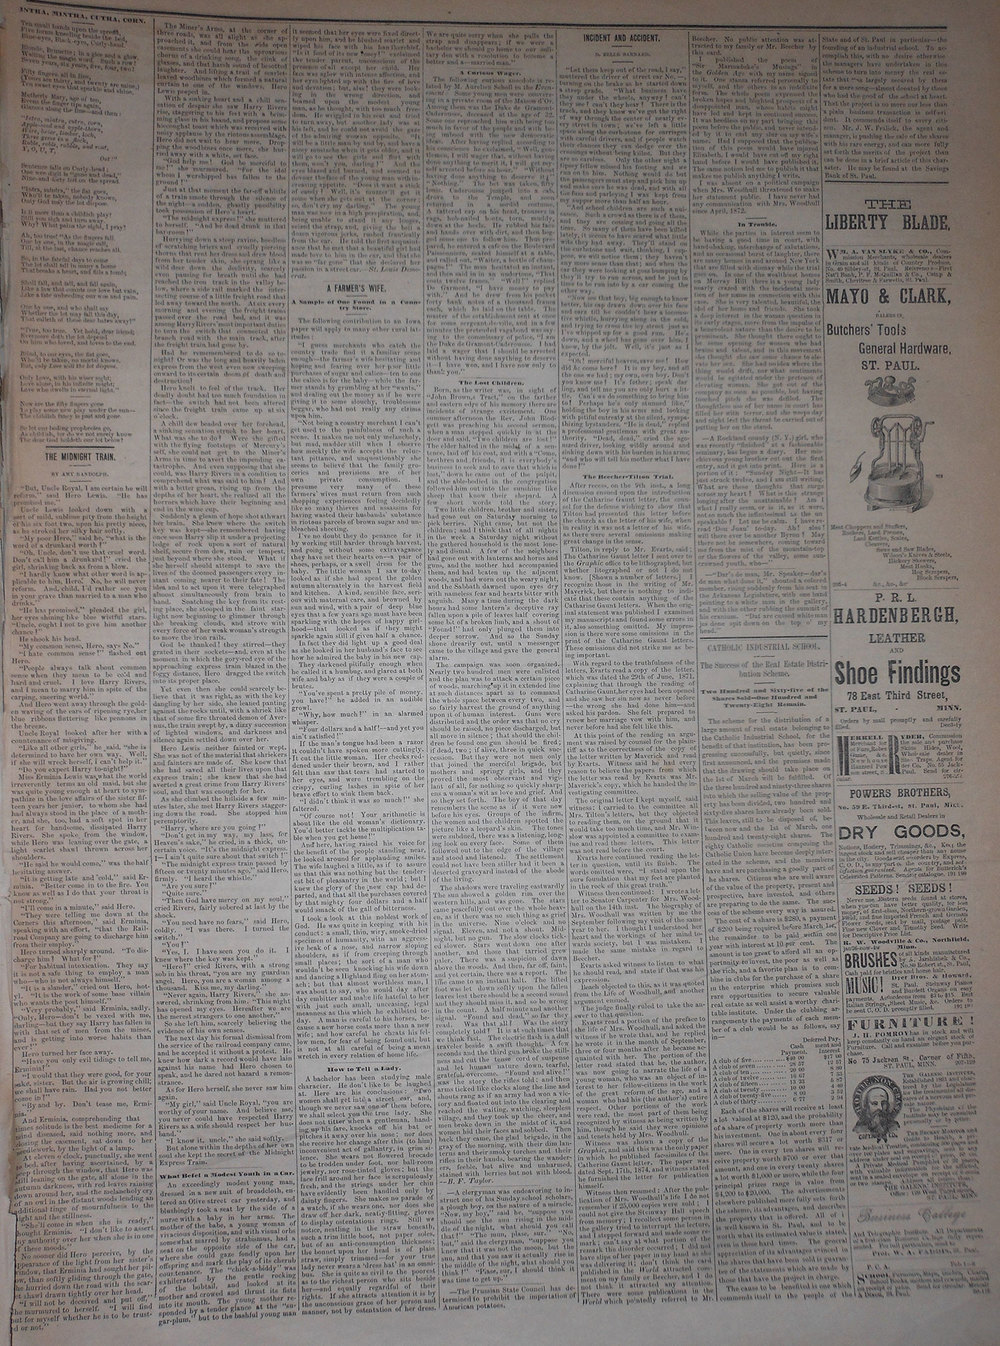 2/17/1875, p3